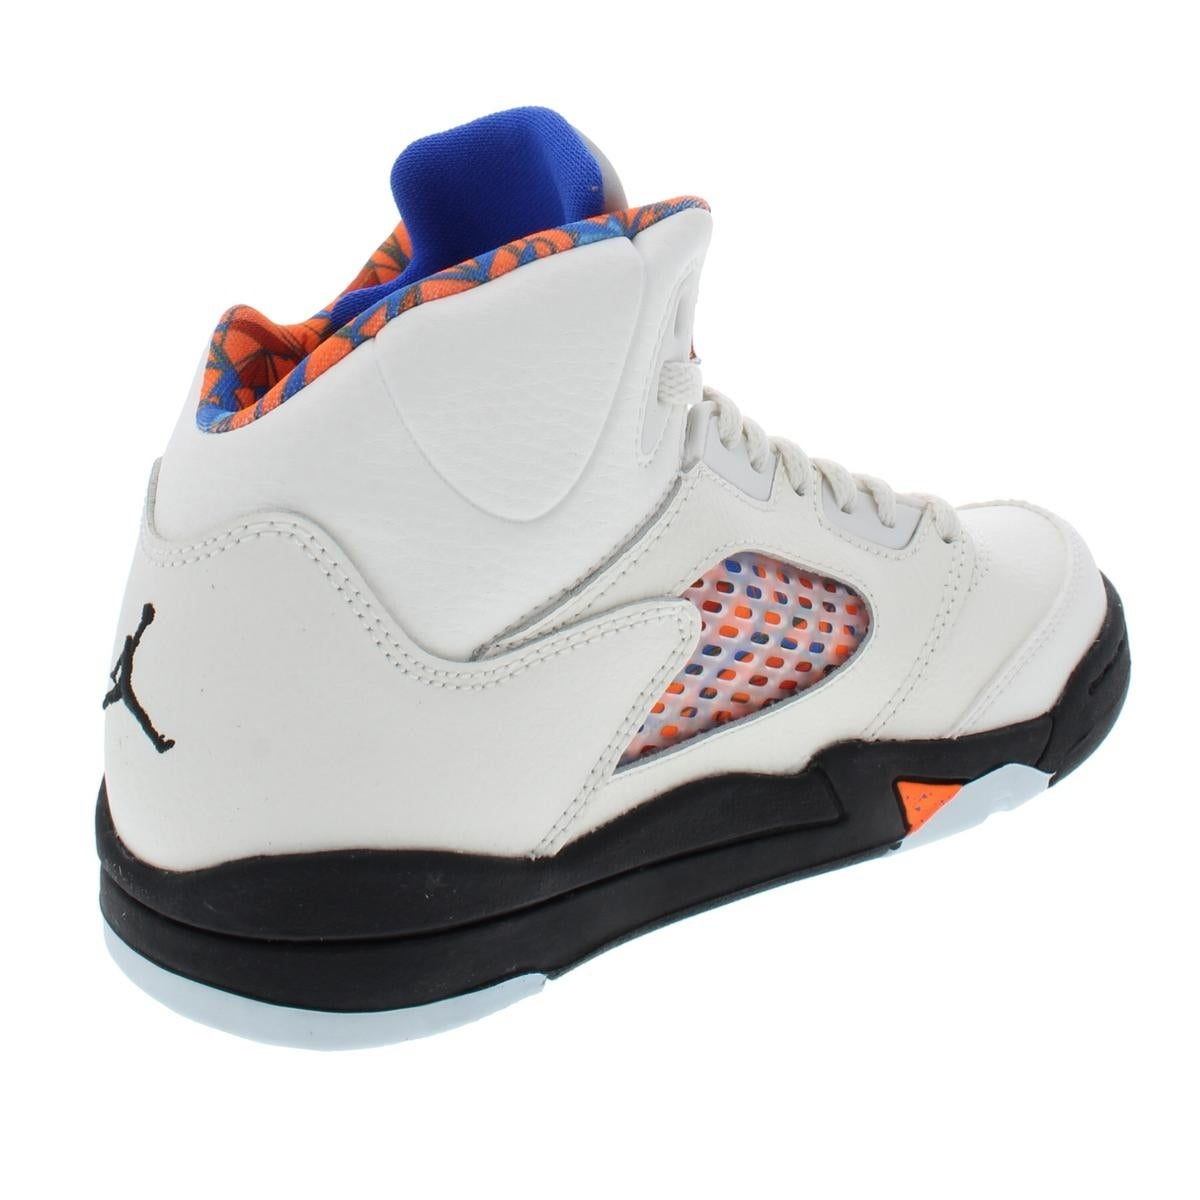 super popular 1facb 8887c Jordan Boys Jordan 5 Retro PS Basketball Shoes Little Kid Leather